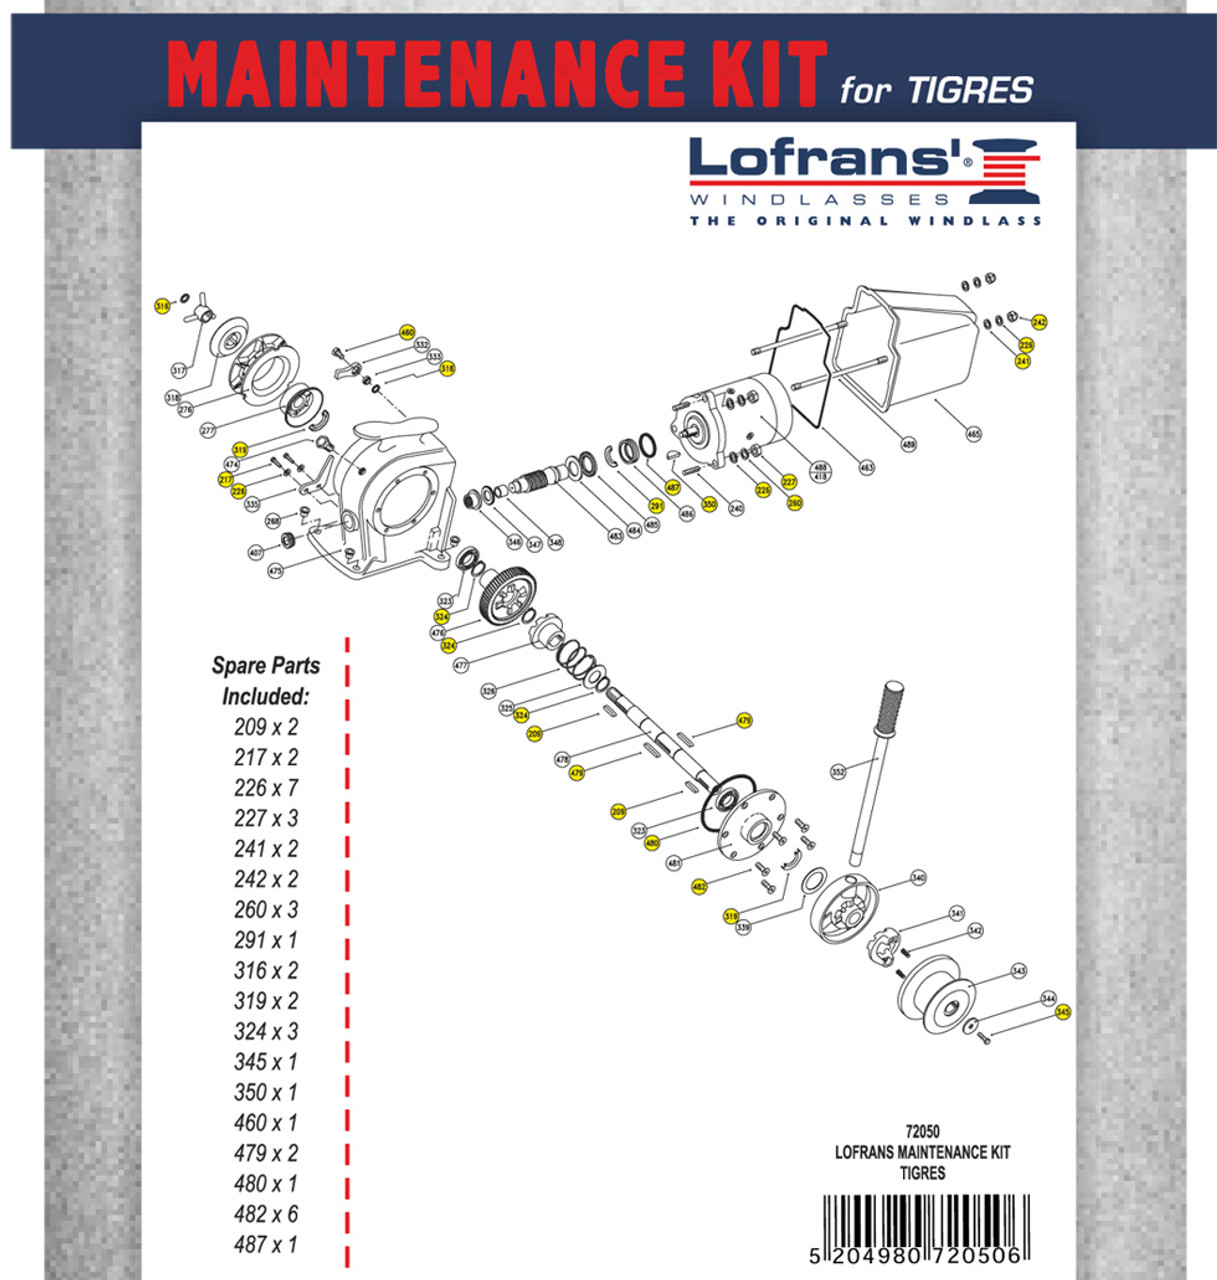 Lofrans LWP72050 Maintenance Kit for Tigres Windlass